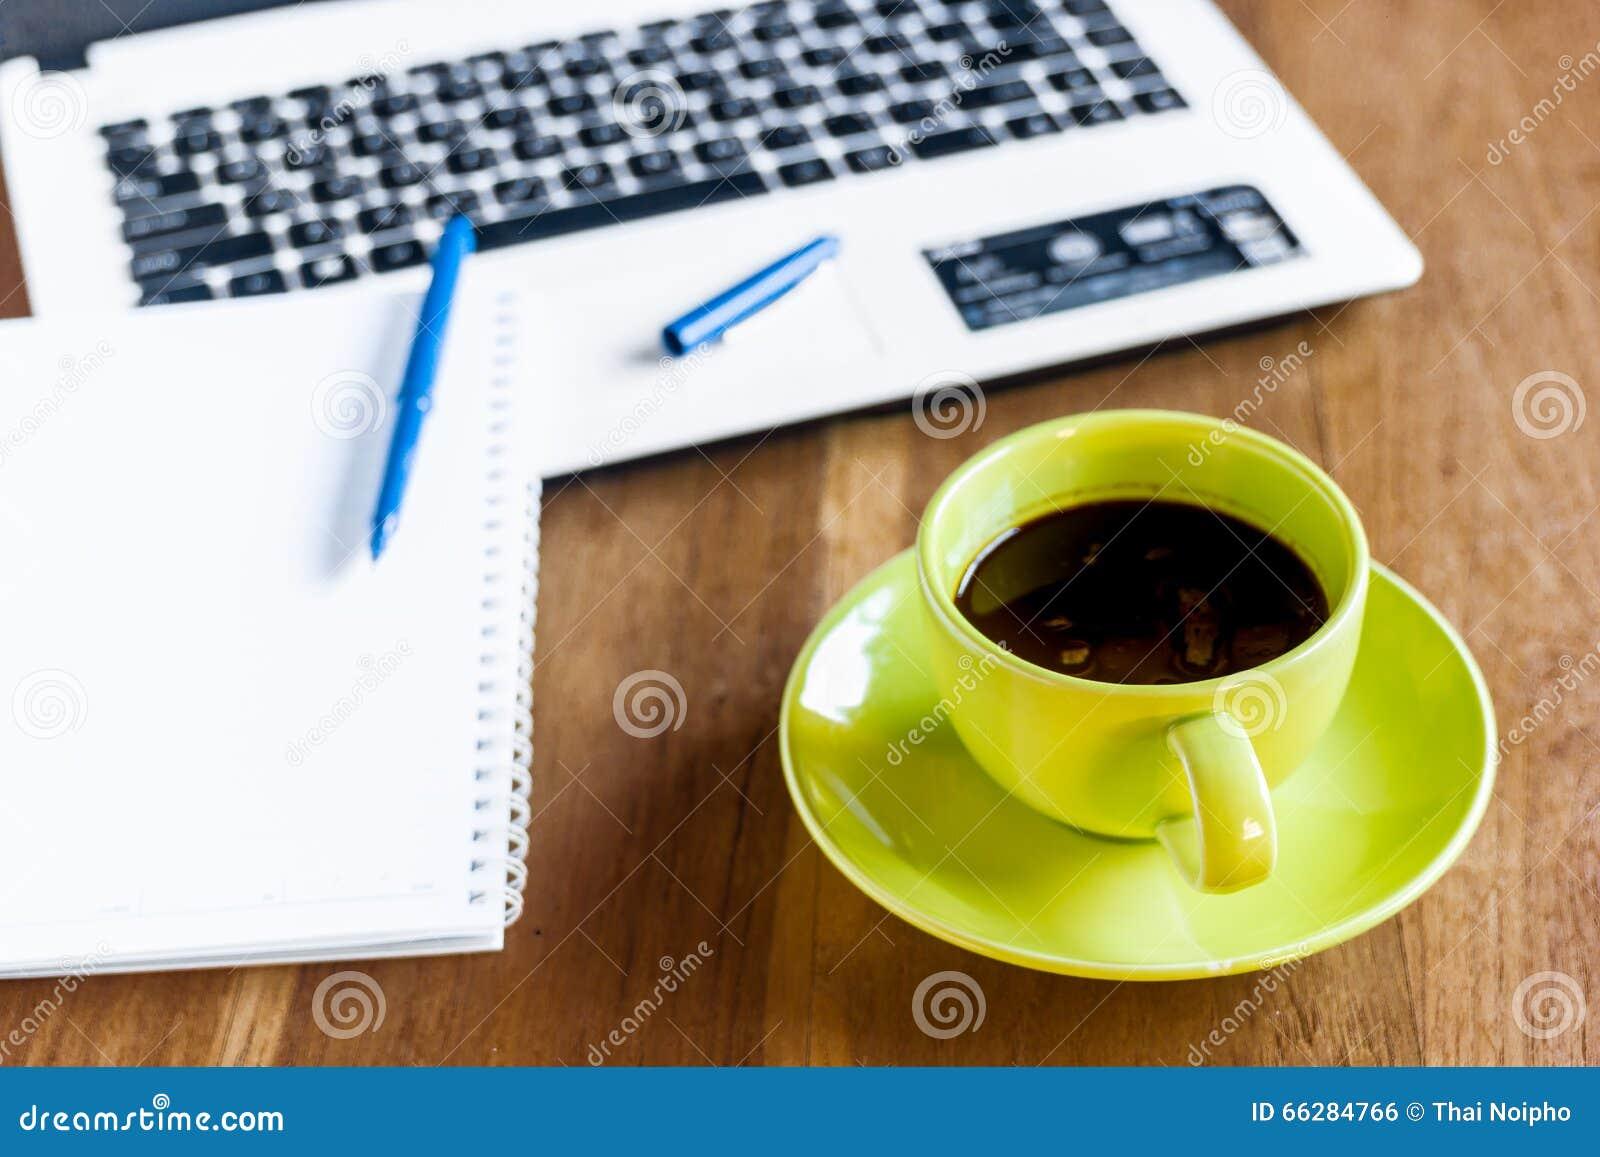 Bureau Fin Noir : Tasse de café noir fournitures de bureau photo stock image du